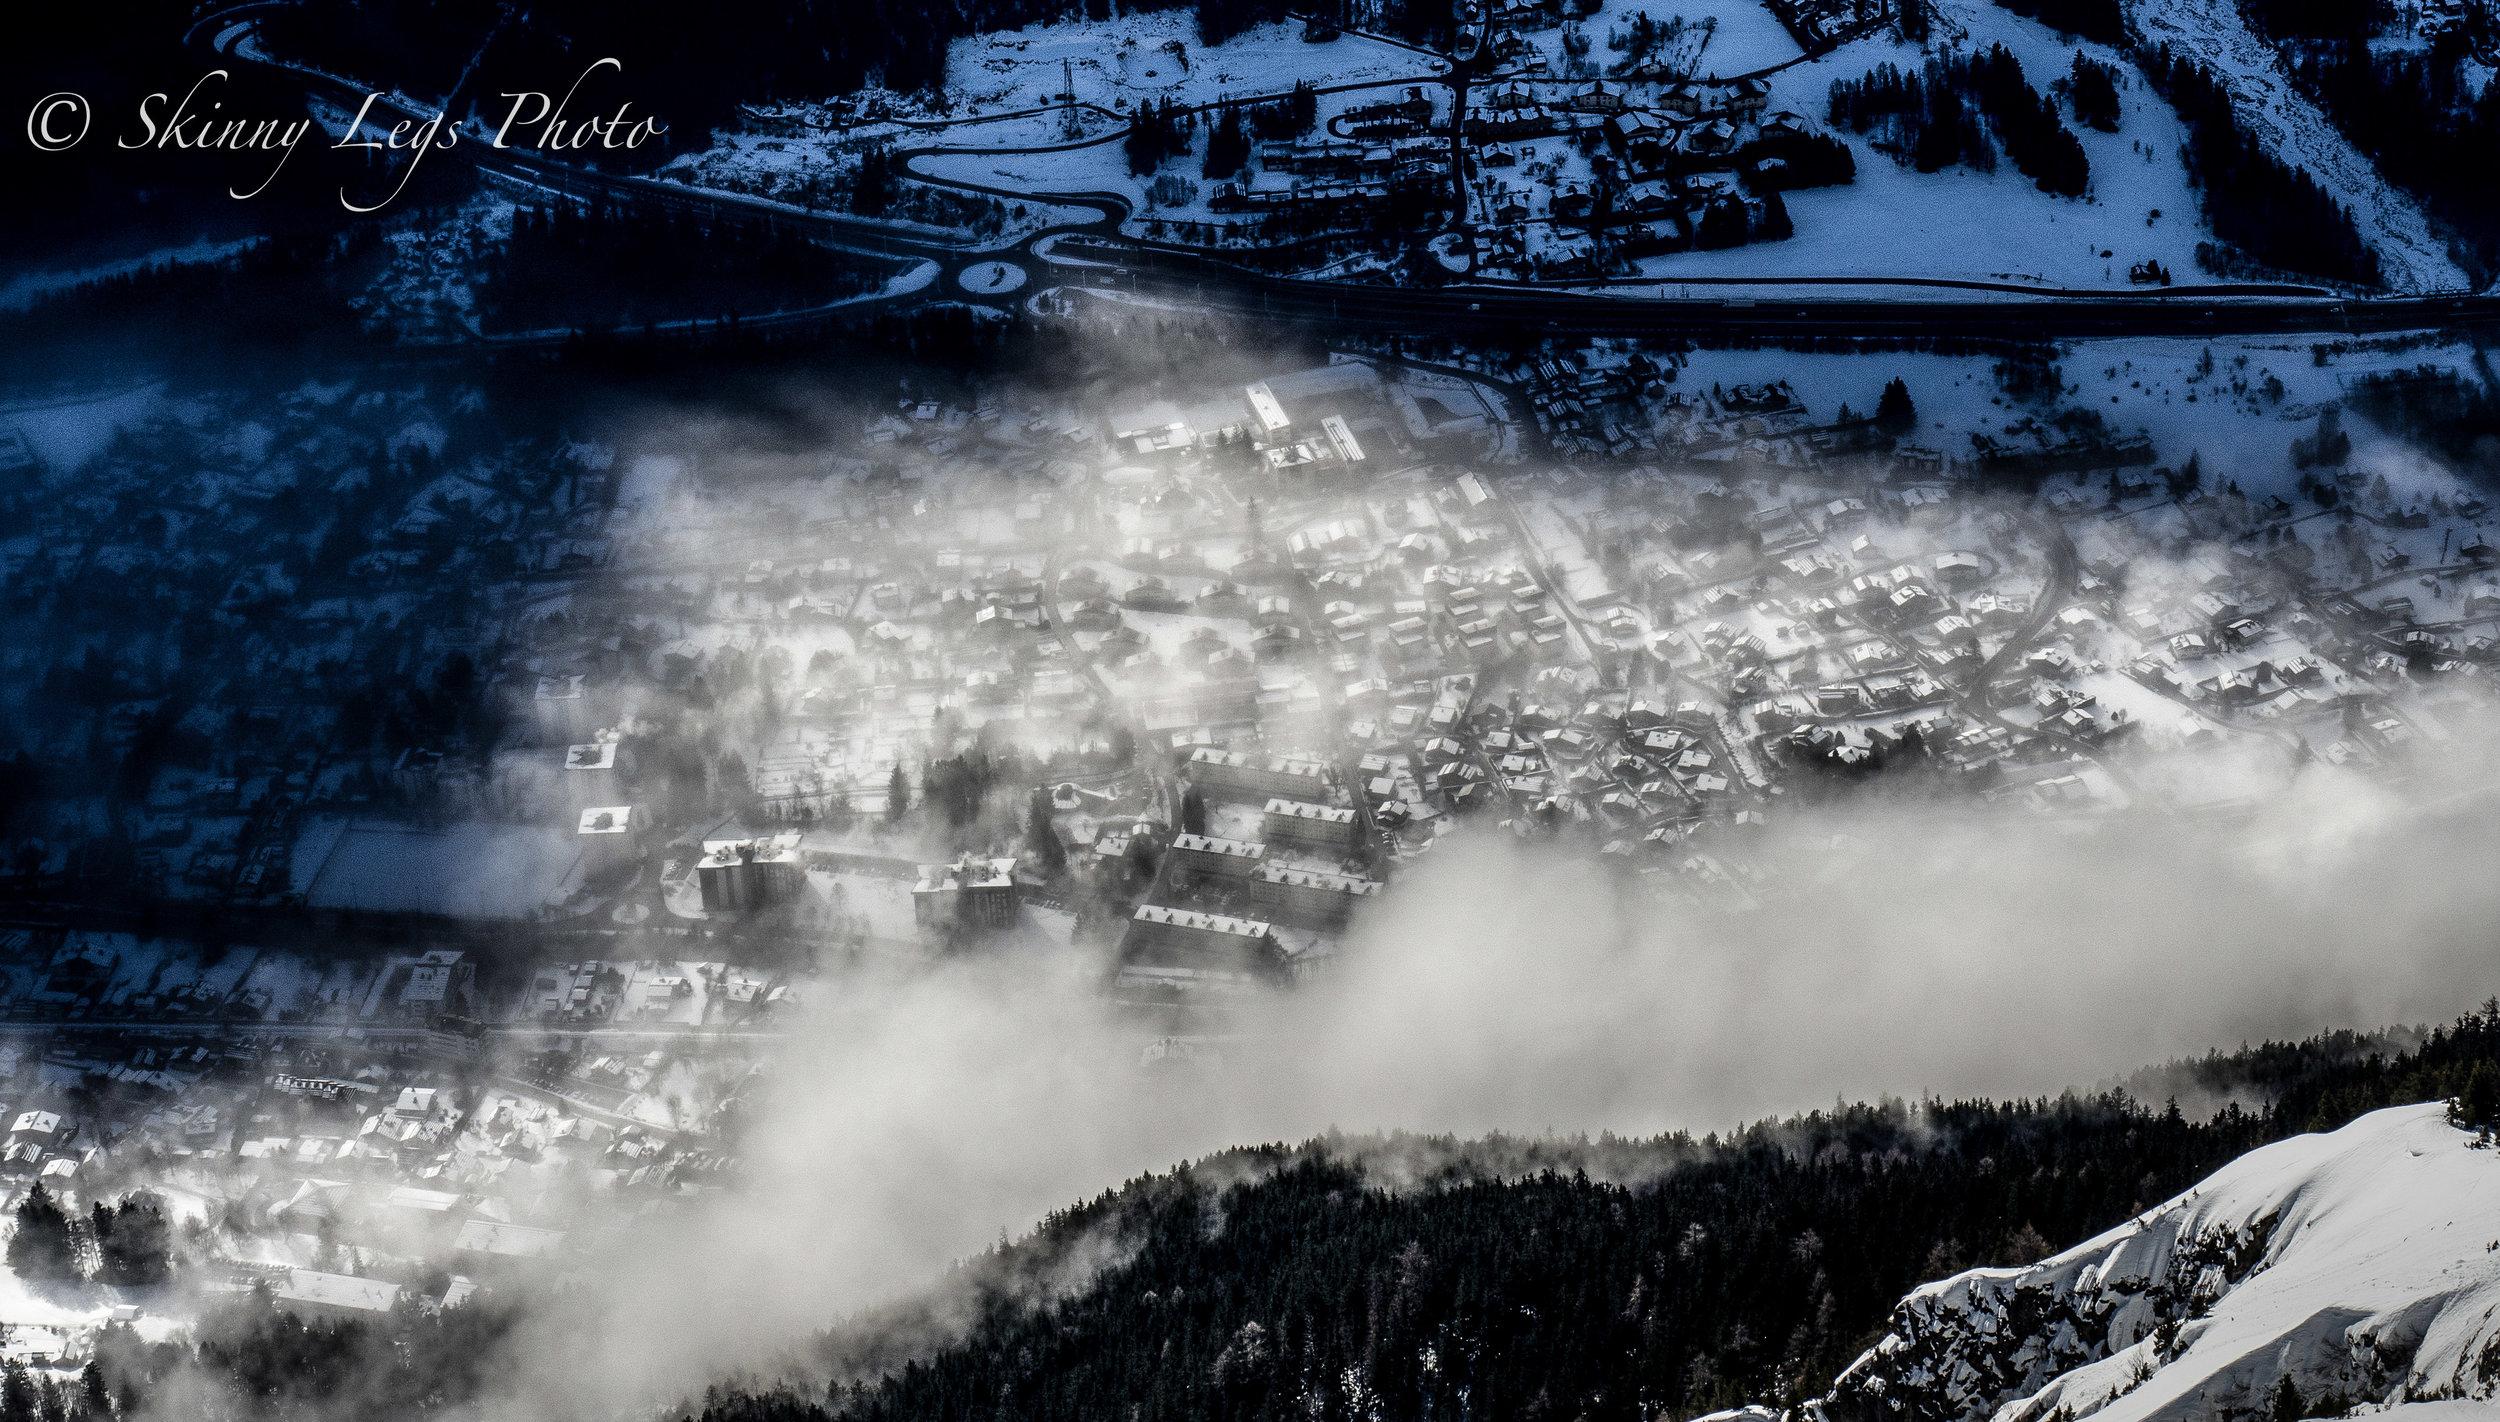 Chamonix in early morning mist